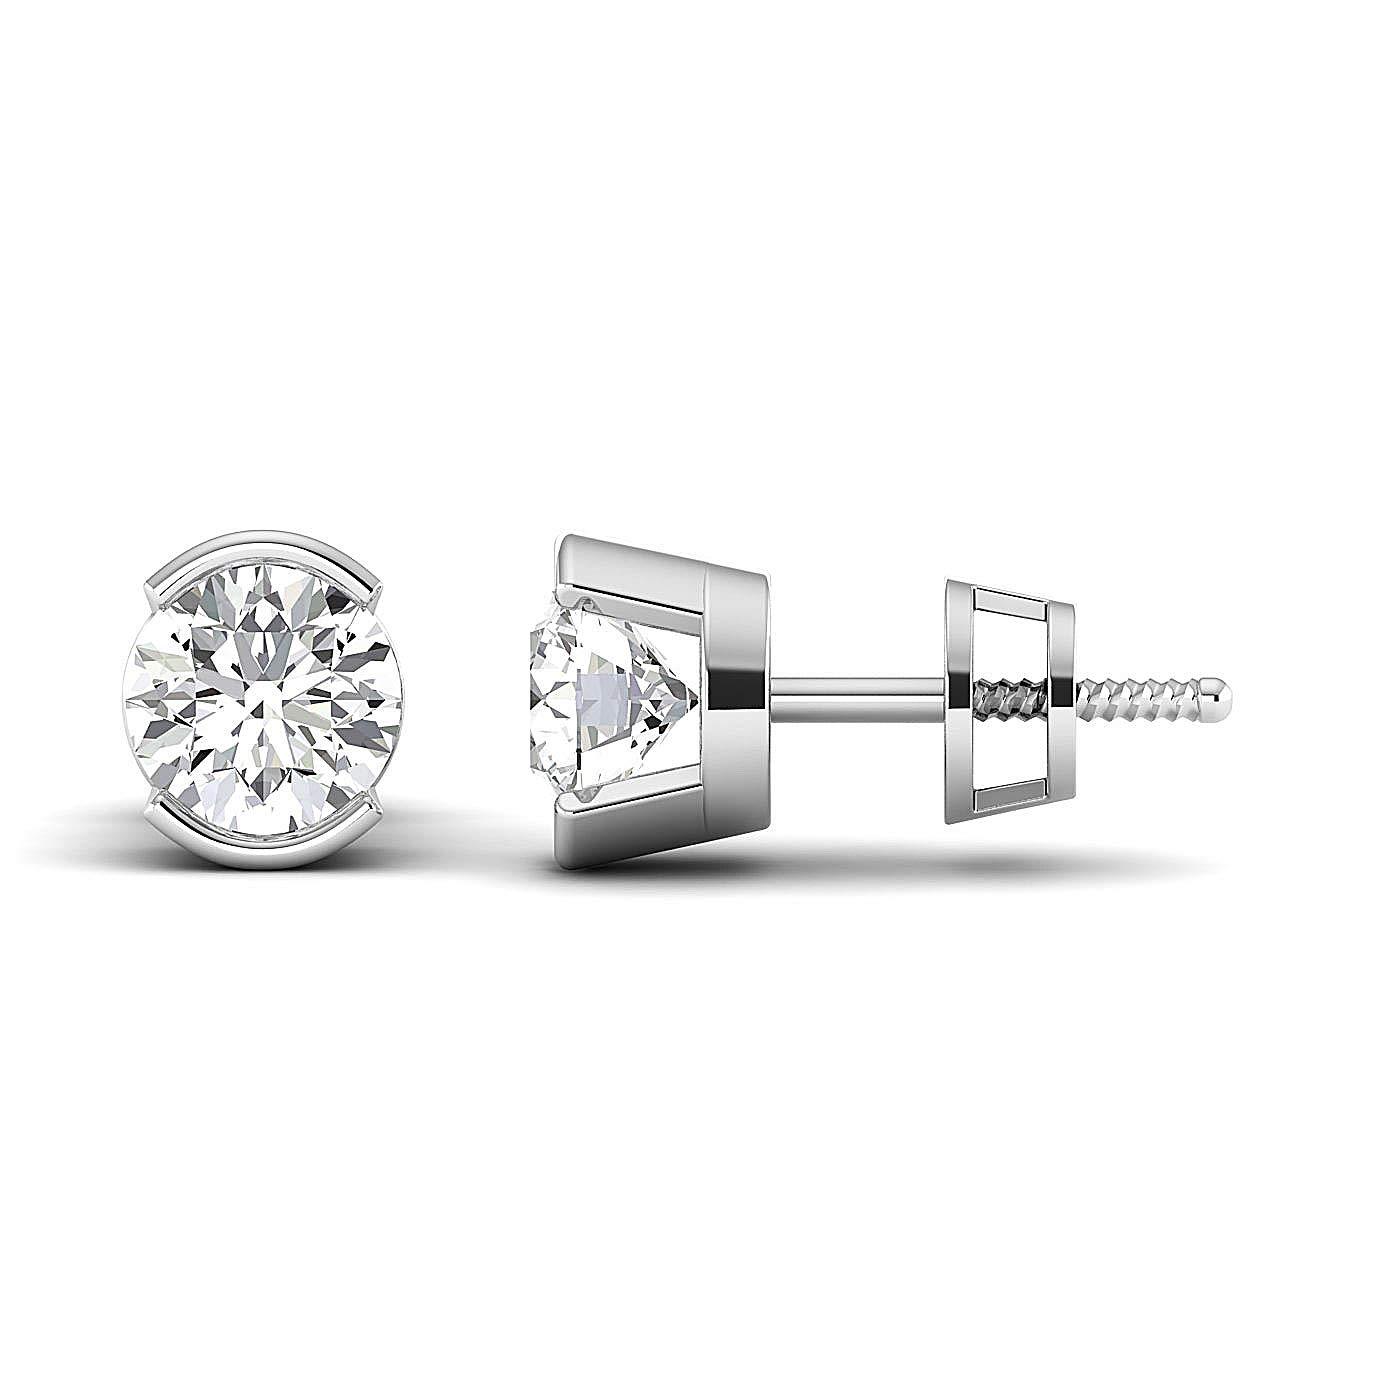 Stud Earrings for Women perfect Jewelry Gifts for Women Teen Girls Earring Studs 0.3 to 4 Carat Moissanite Stud Earrings 18K white-gold GH//VVS Round Brilliant